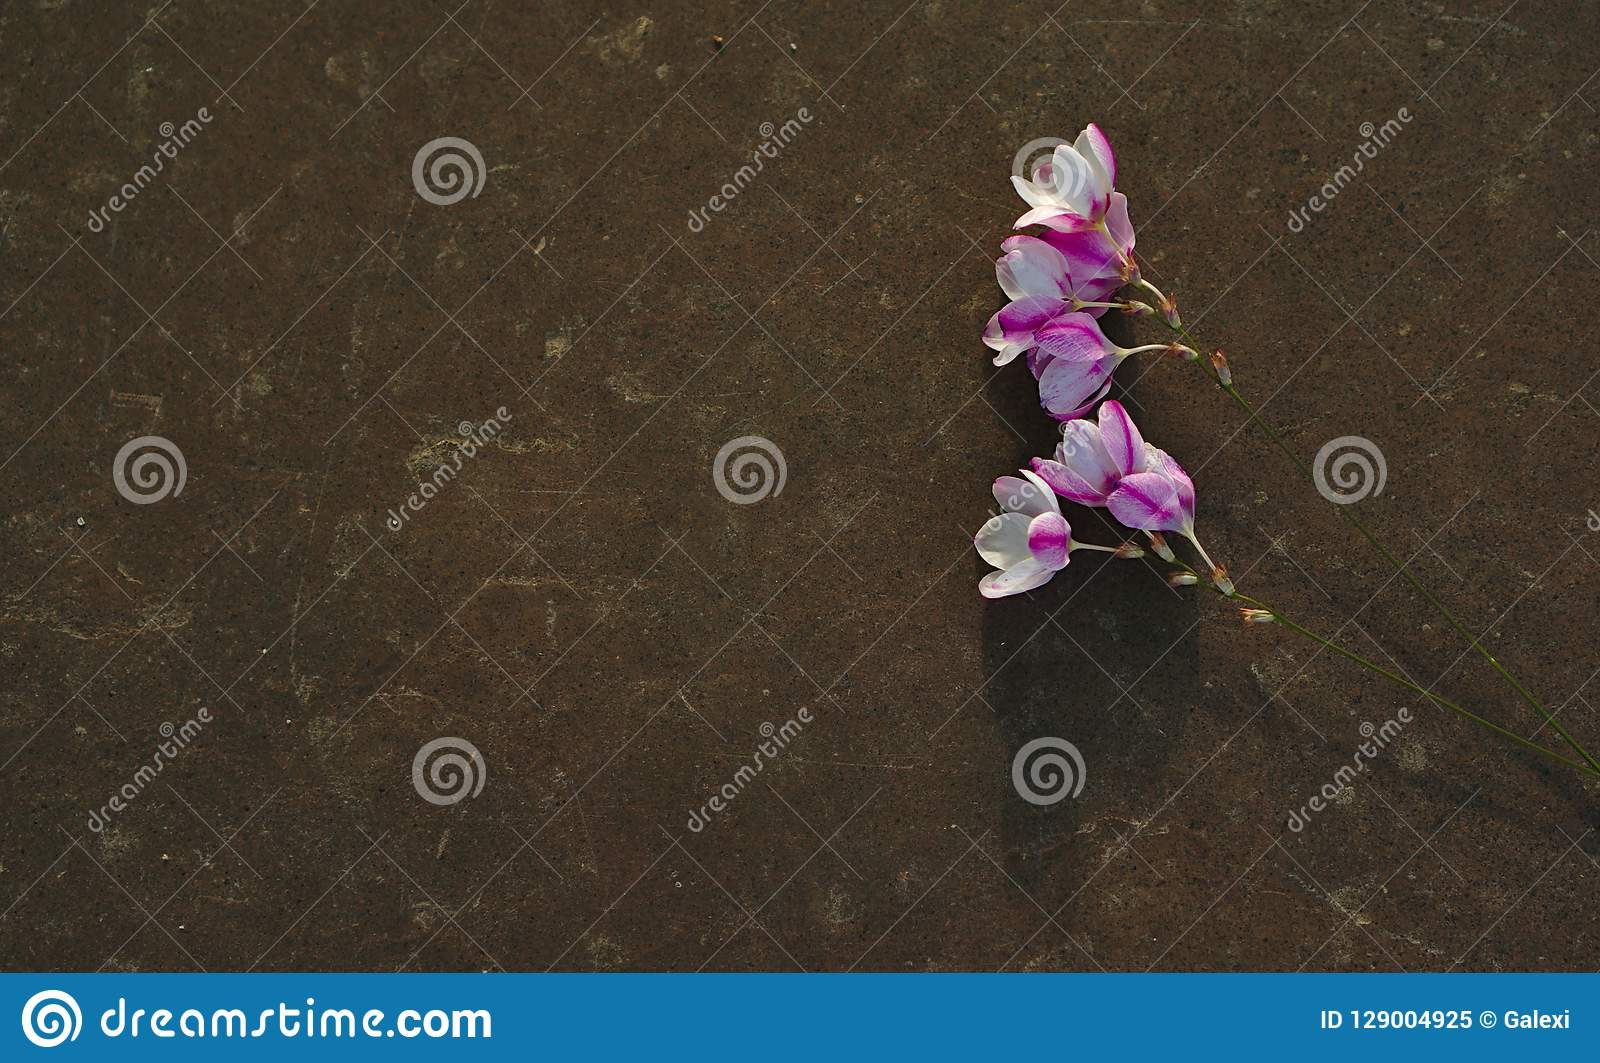 Wild flowers on plain tombstone